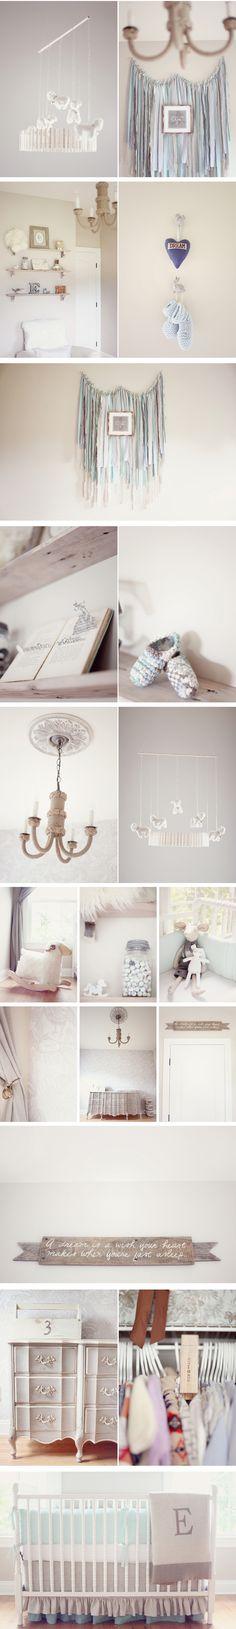 baby boy's vintage nursery design and decor